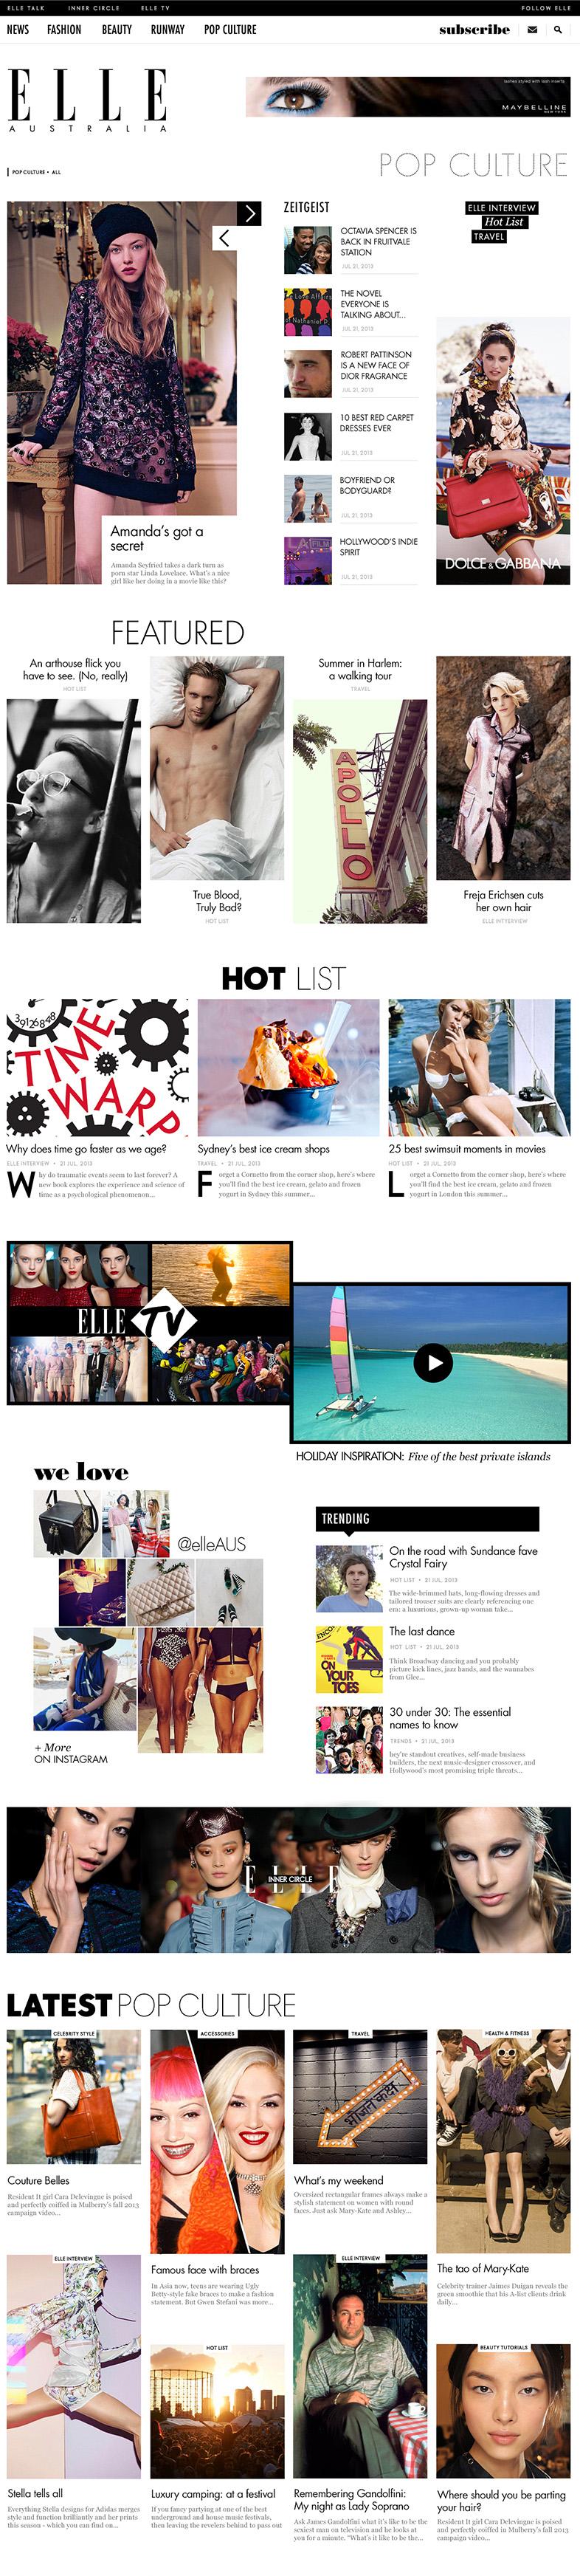 09c_Elle_SectionLanding_PopCulture copy.jpg